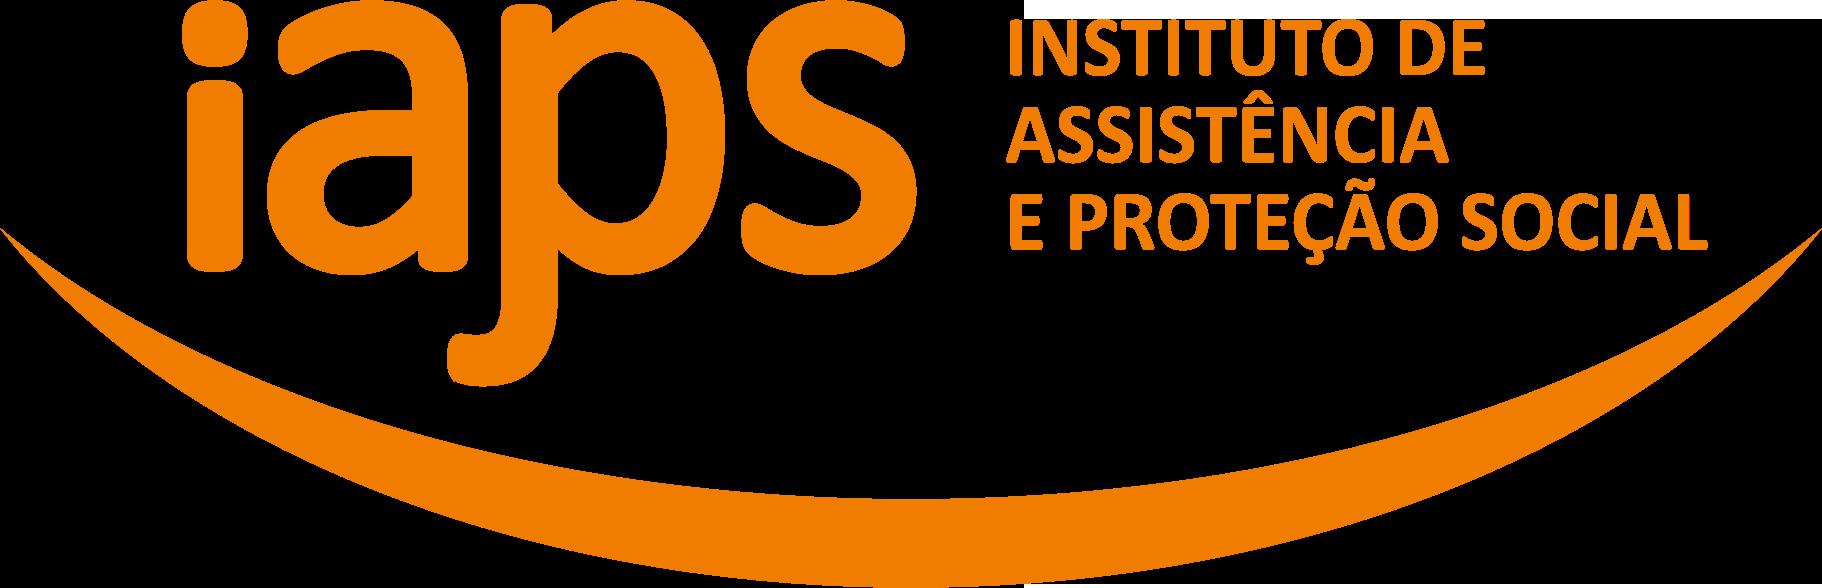 logo-iaps